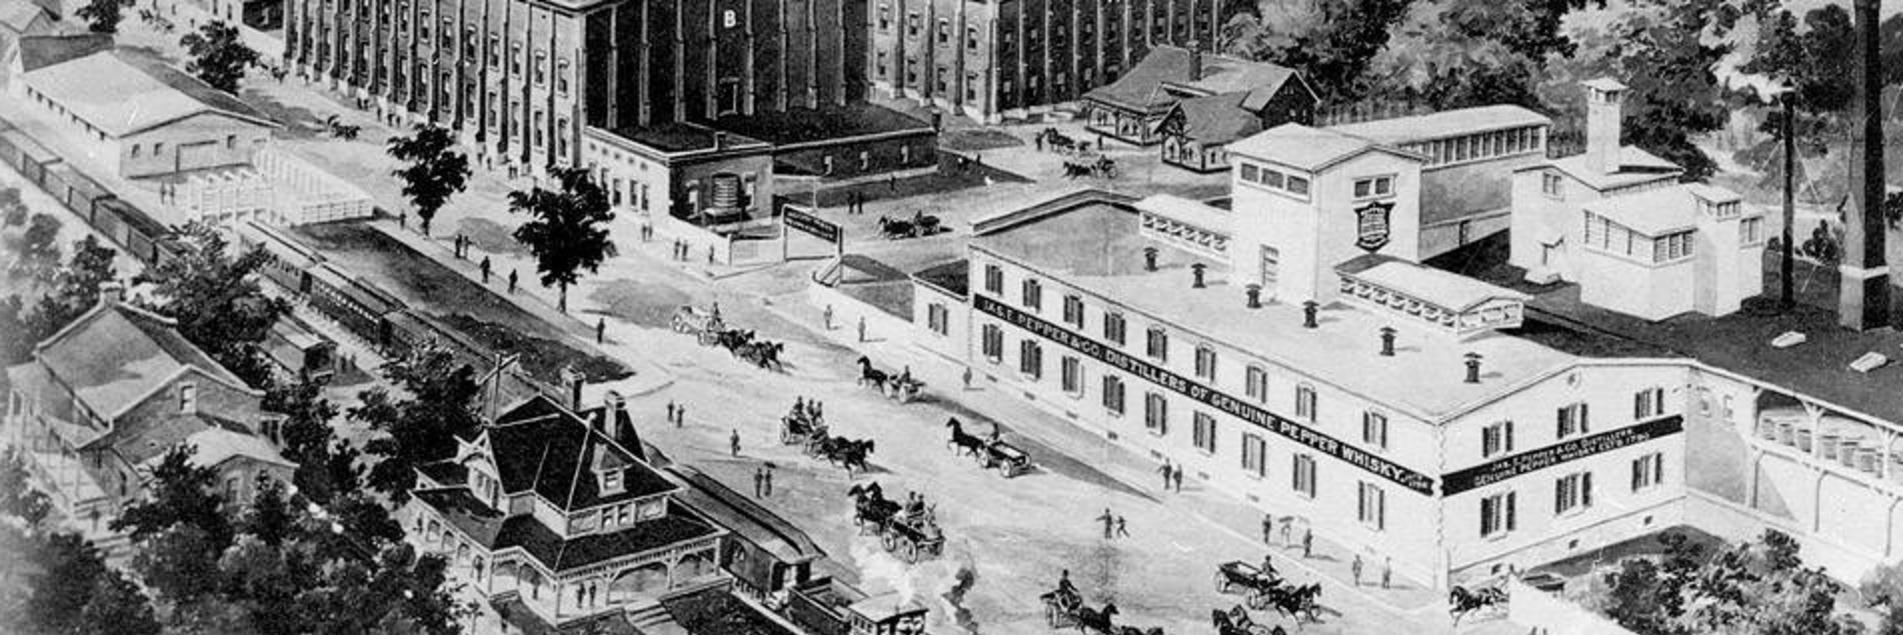 Historic Bourbon Distillery District